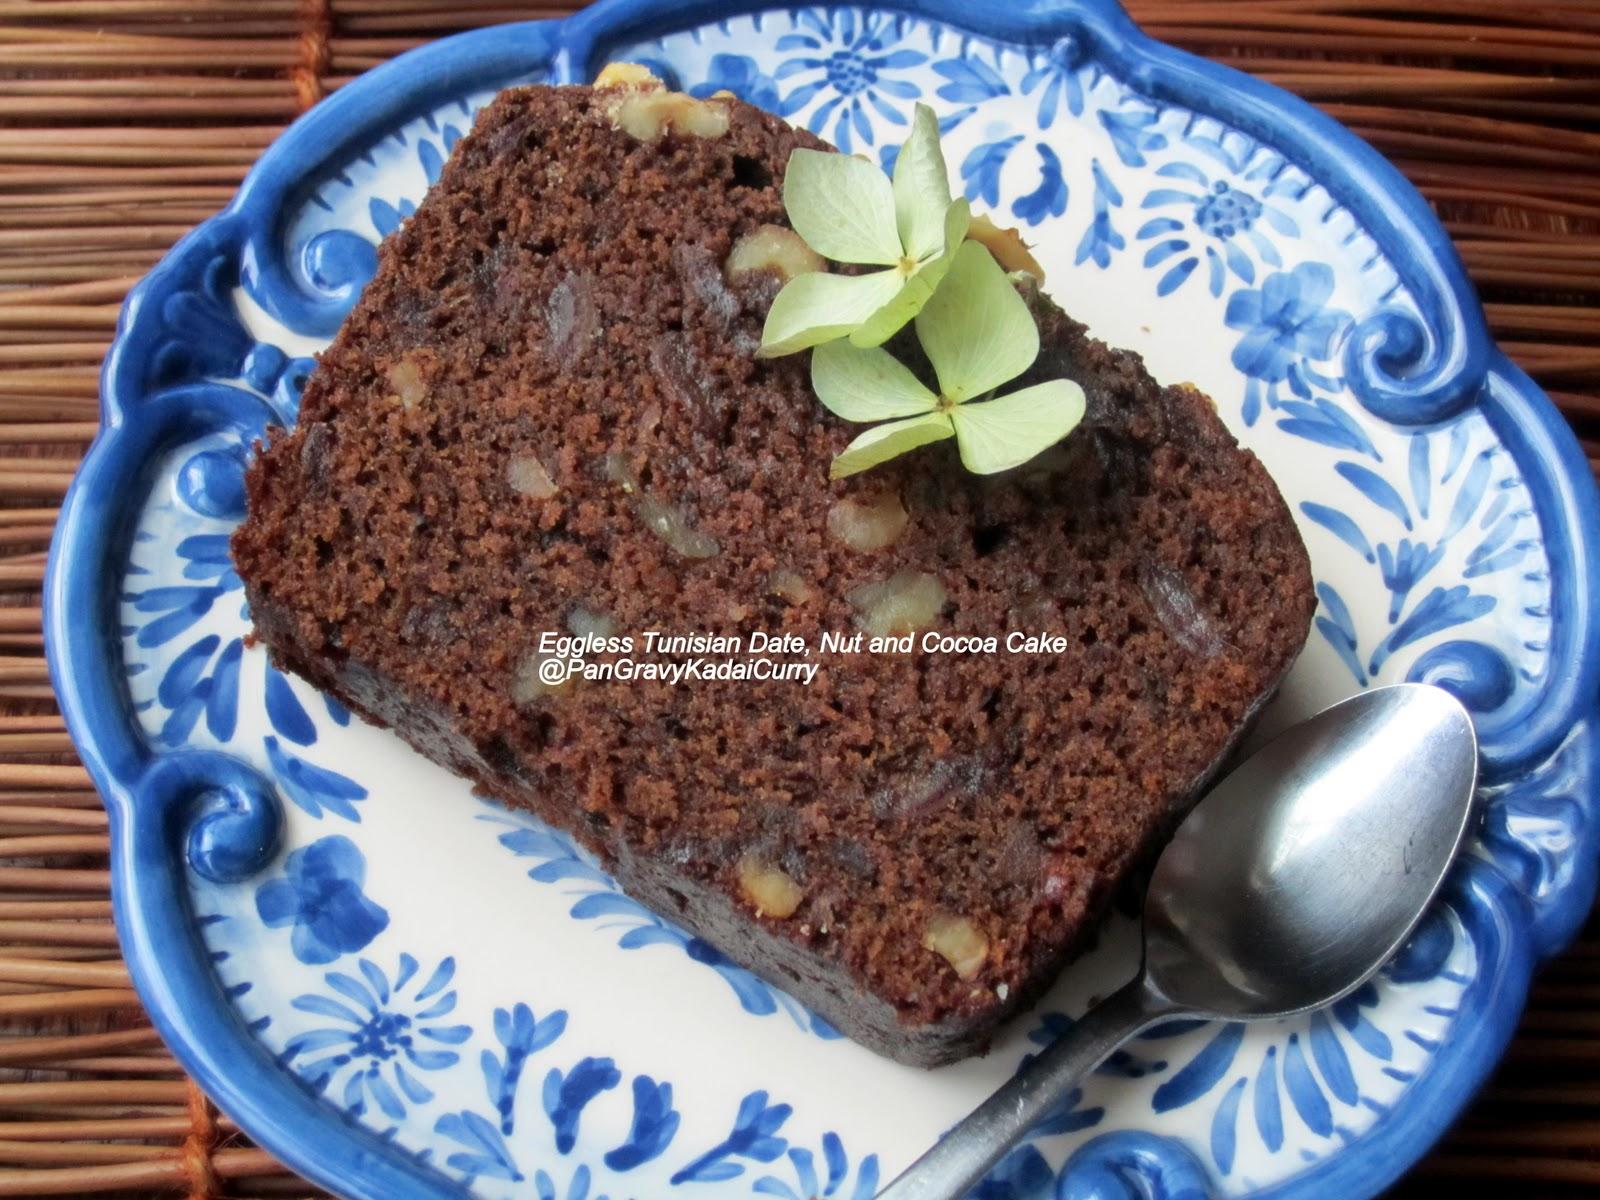 Egg Cake Recipe In Kadai: Pan Gravy Kadai Curry: Egg-less Tunisian Date, Nut